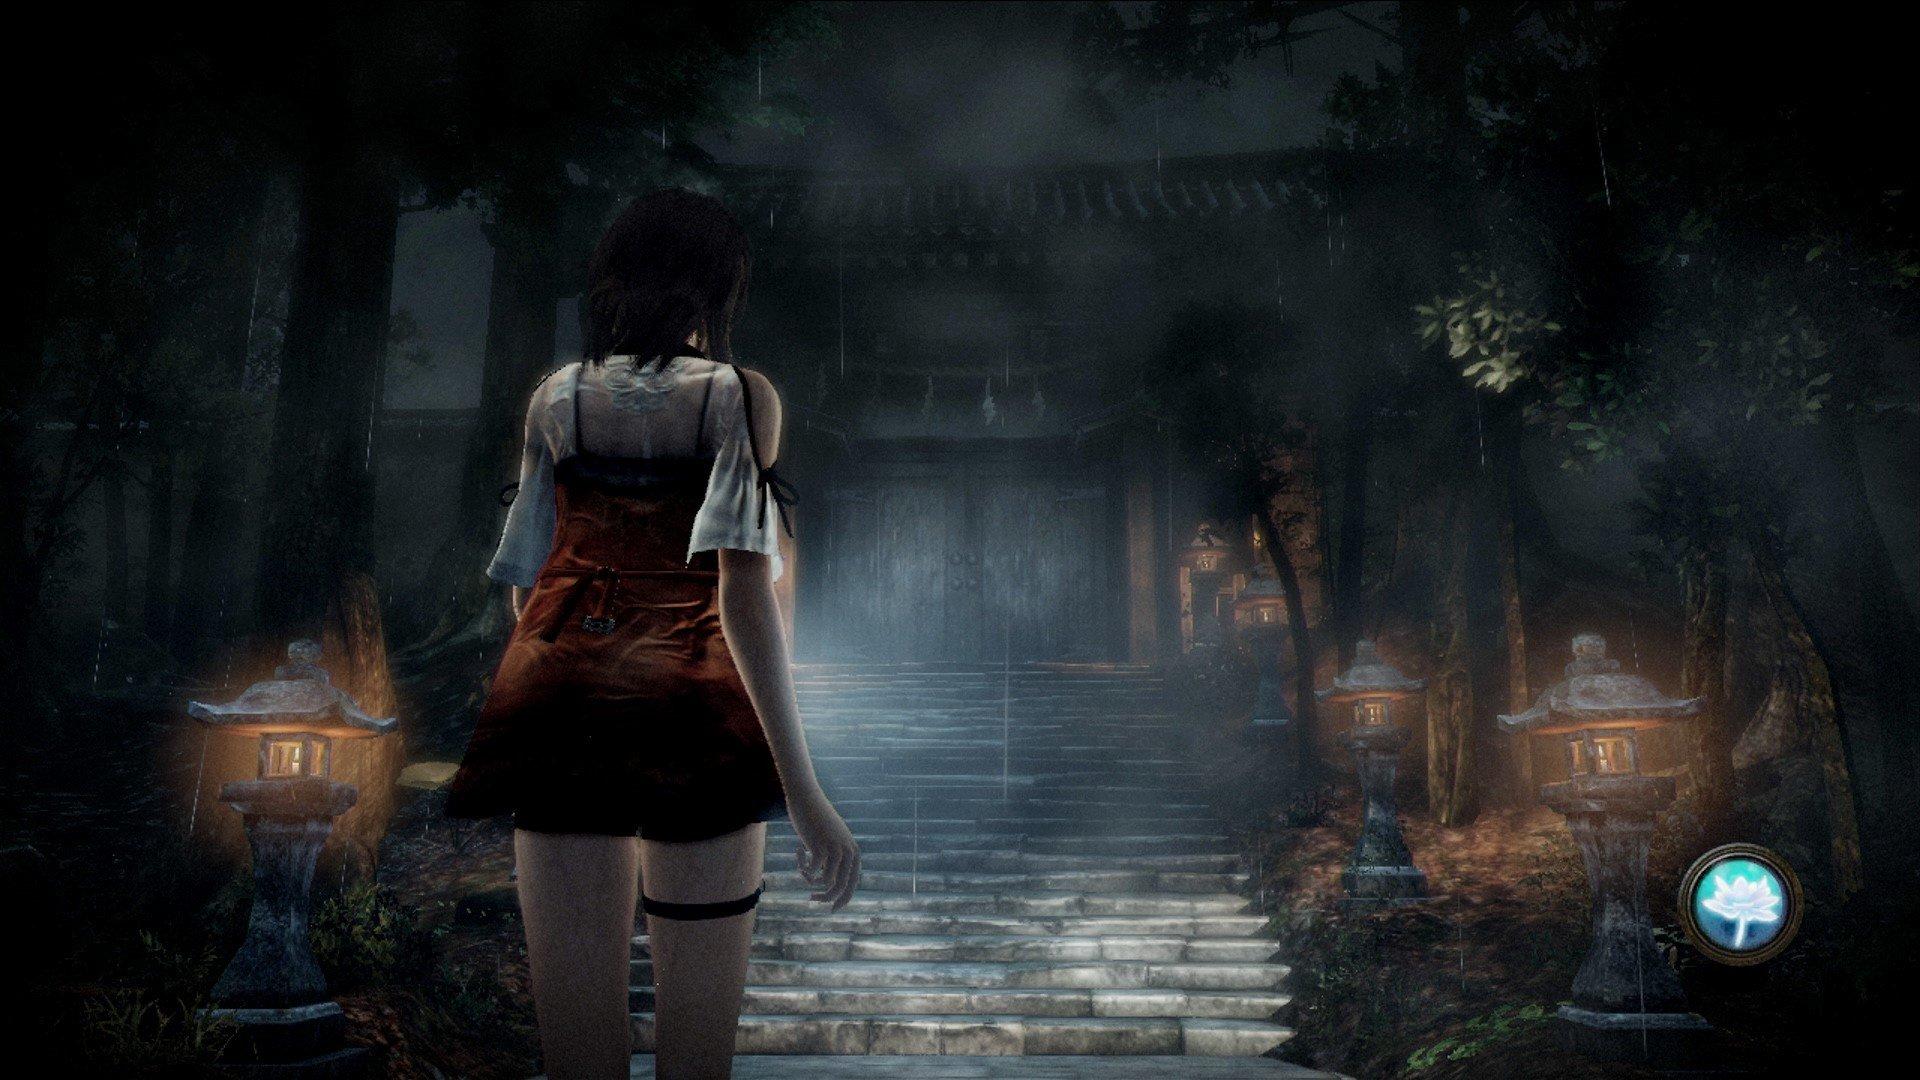 Fatal Frame V Announced for Wii U in North America